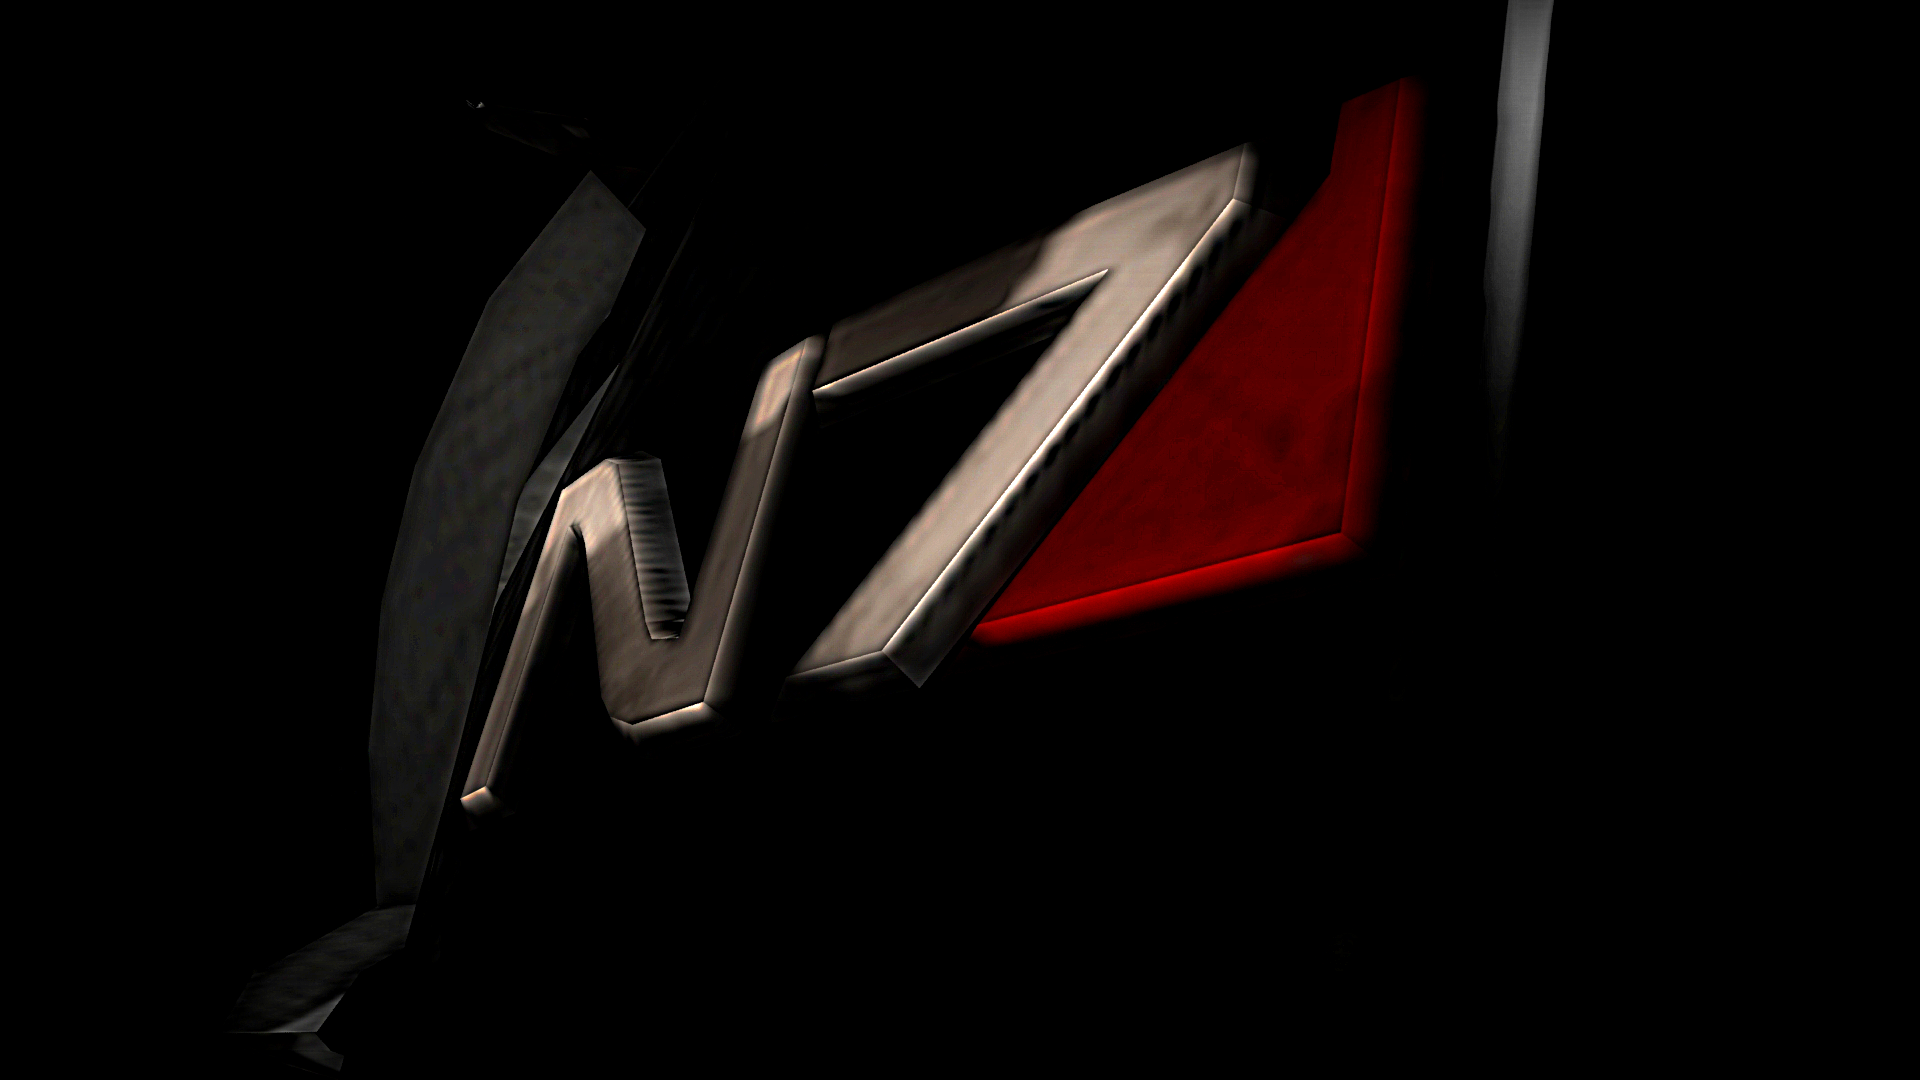 N7 wallpaper